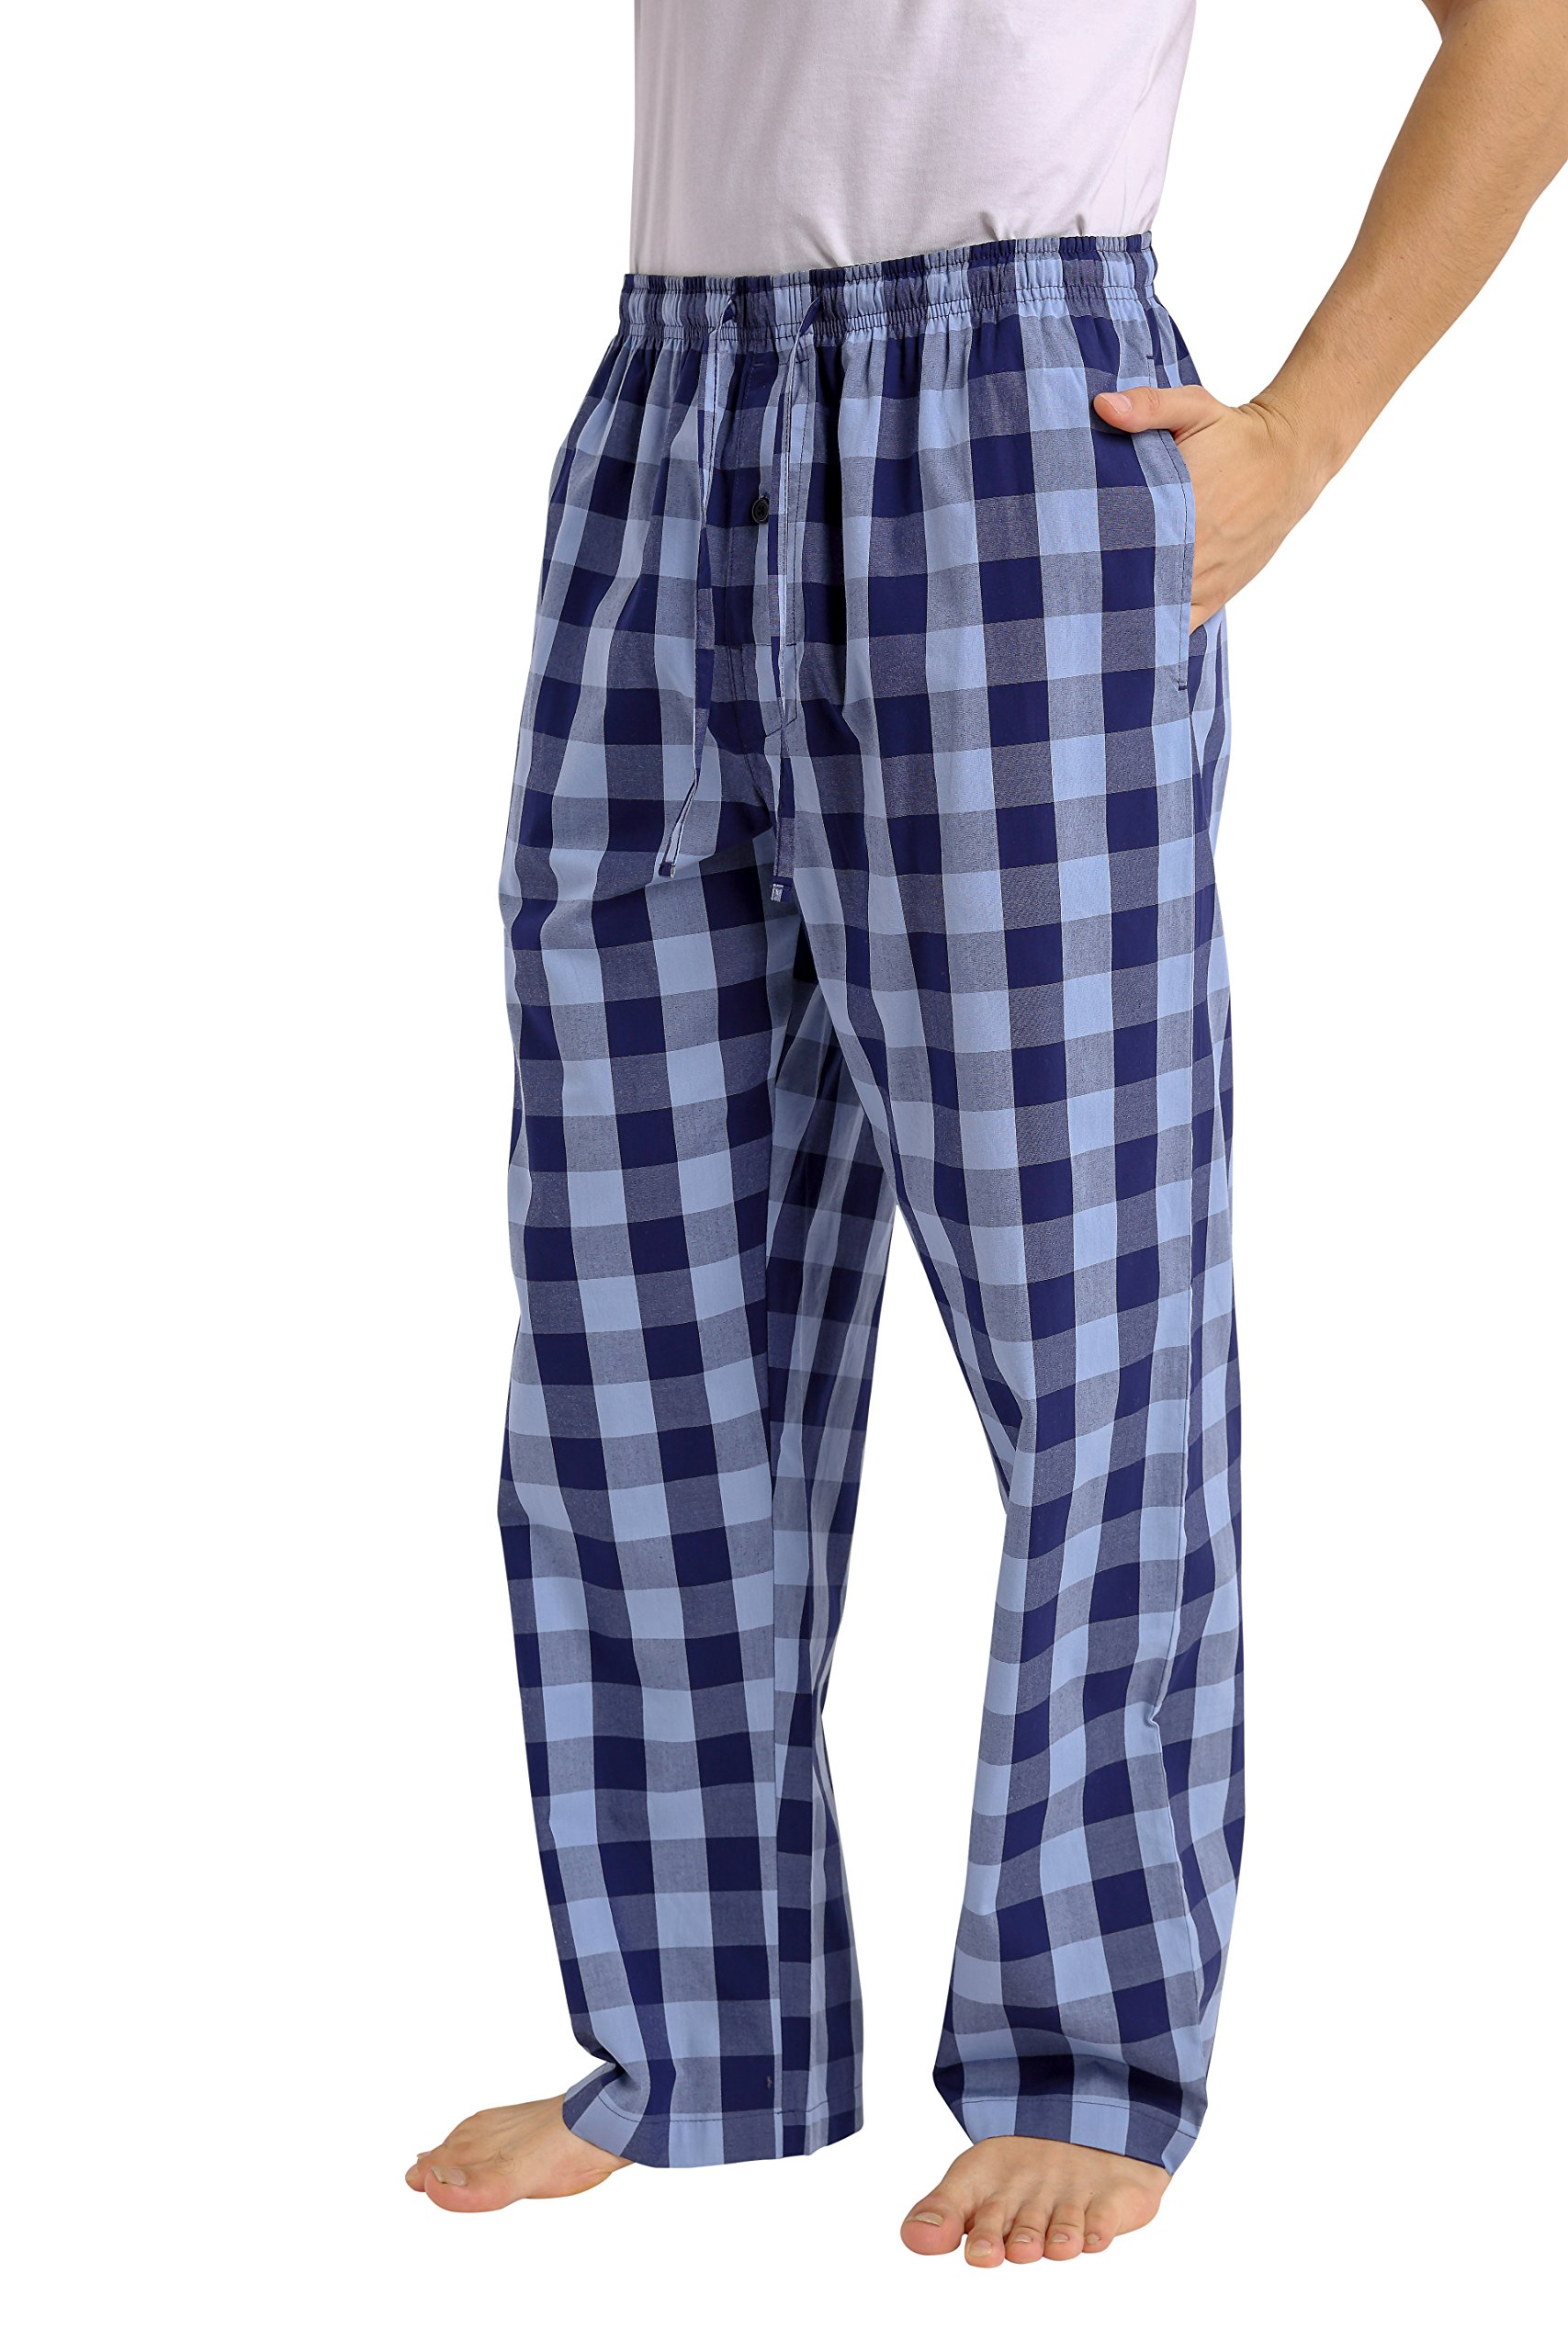 CYZ Men's 100% Cotton Poplin Pajama Lounge Sleep Pant-F1710-L